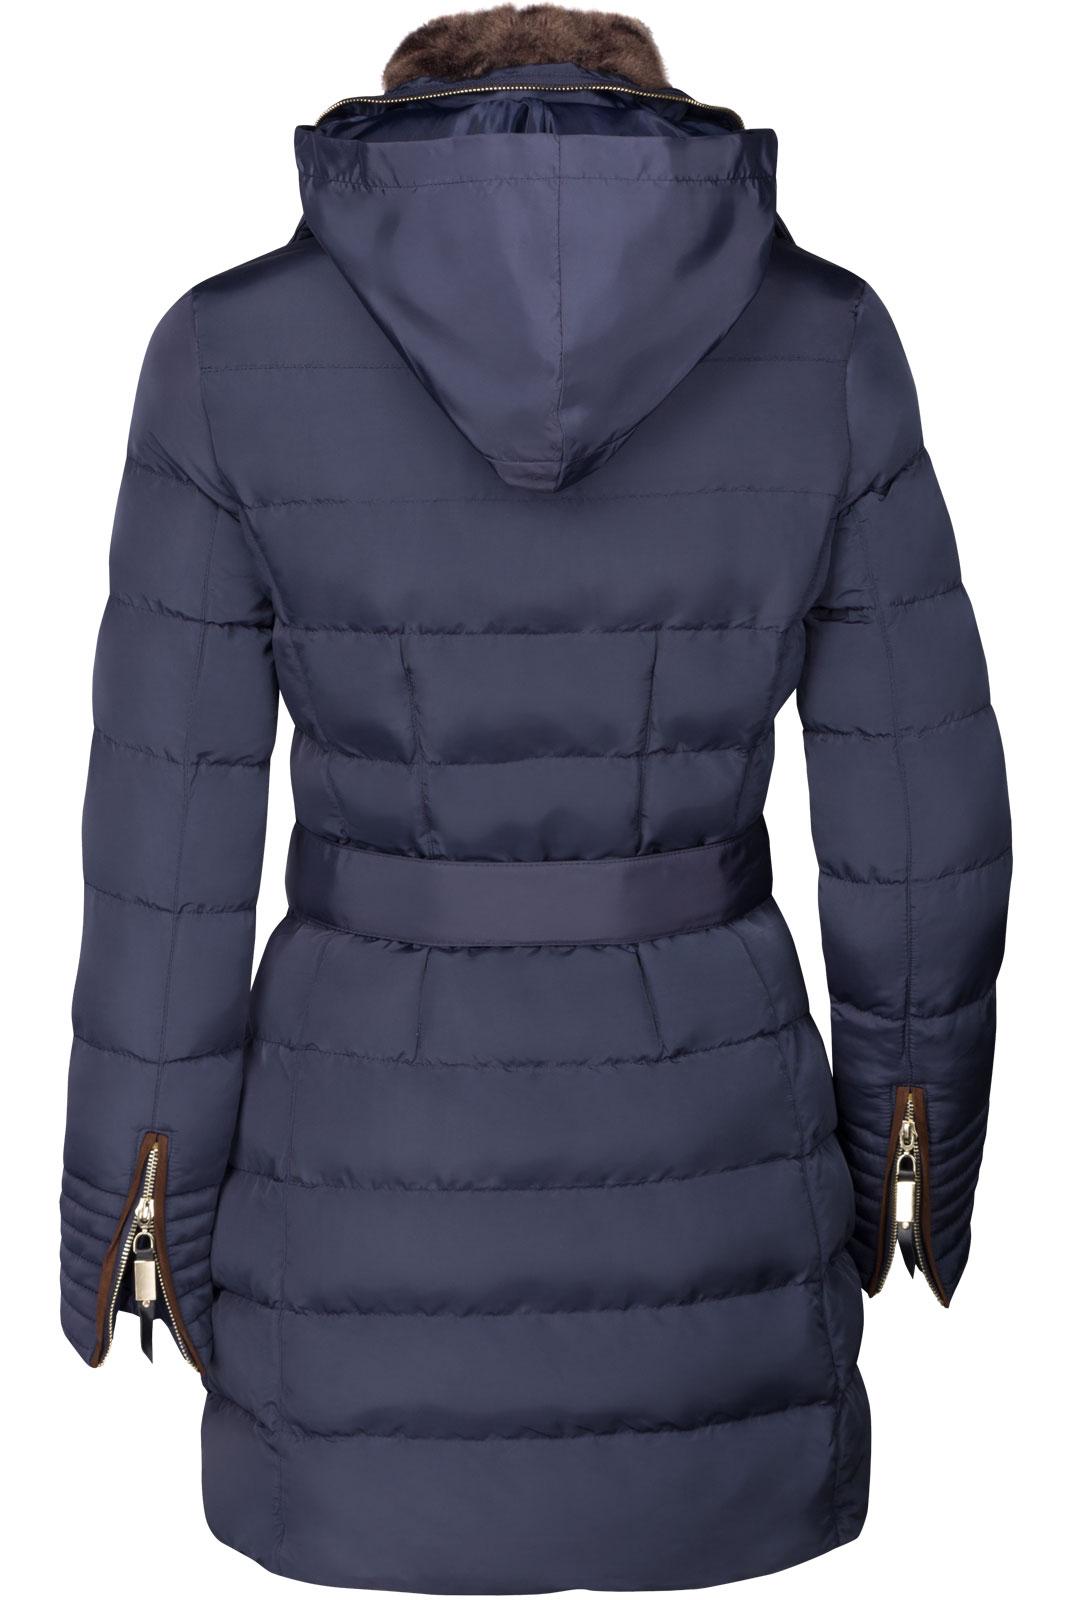 damen winter parka mantel gef ttert jacke fell kragen kapuze lang alaska ebay. Black Bedroom Furniture Sets. Home Design Ideas